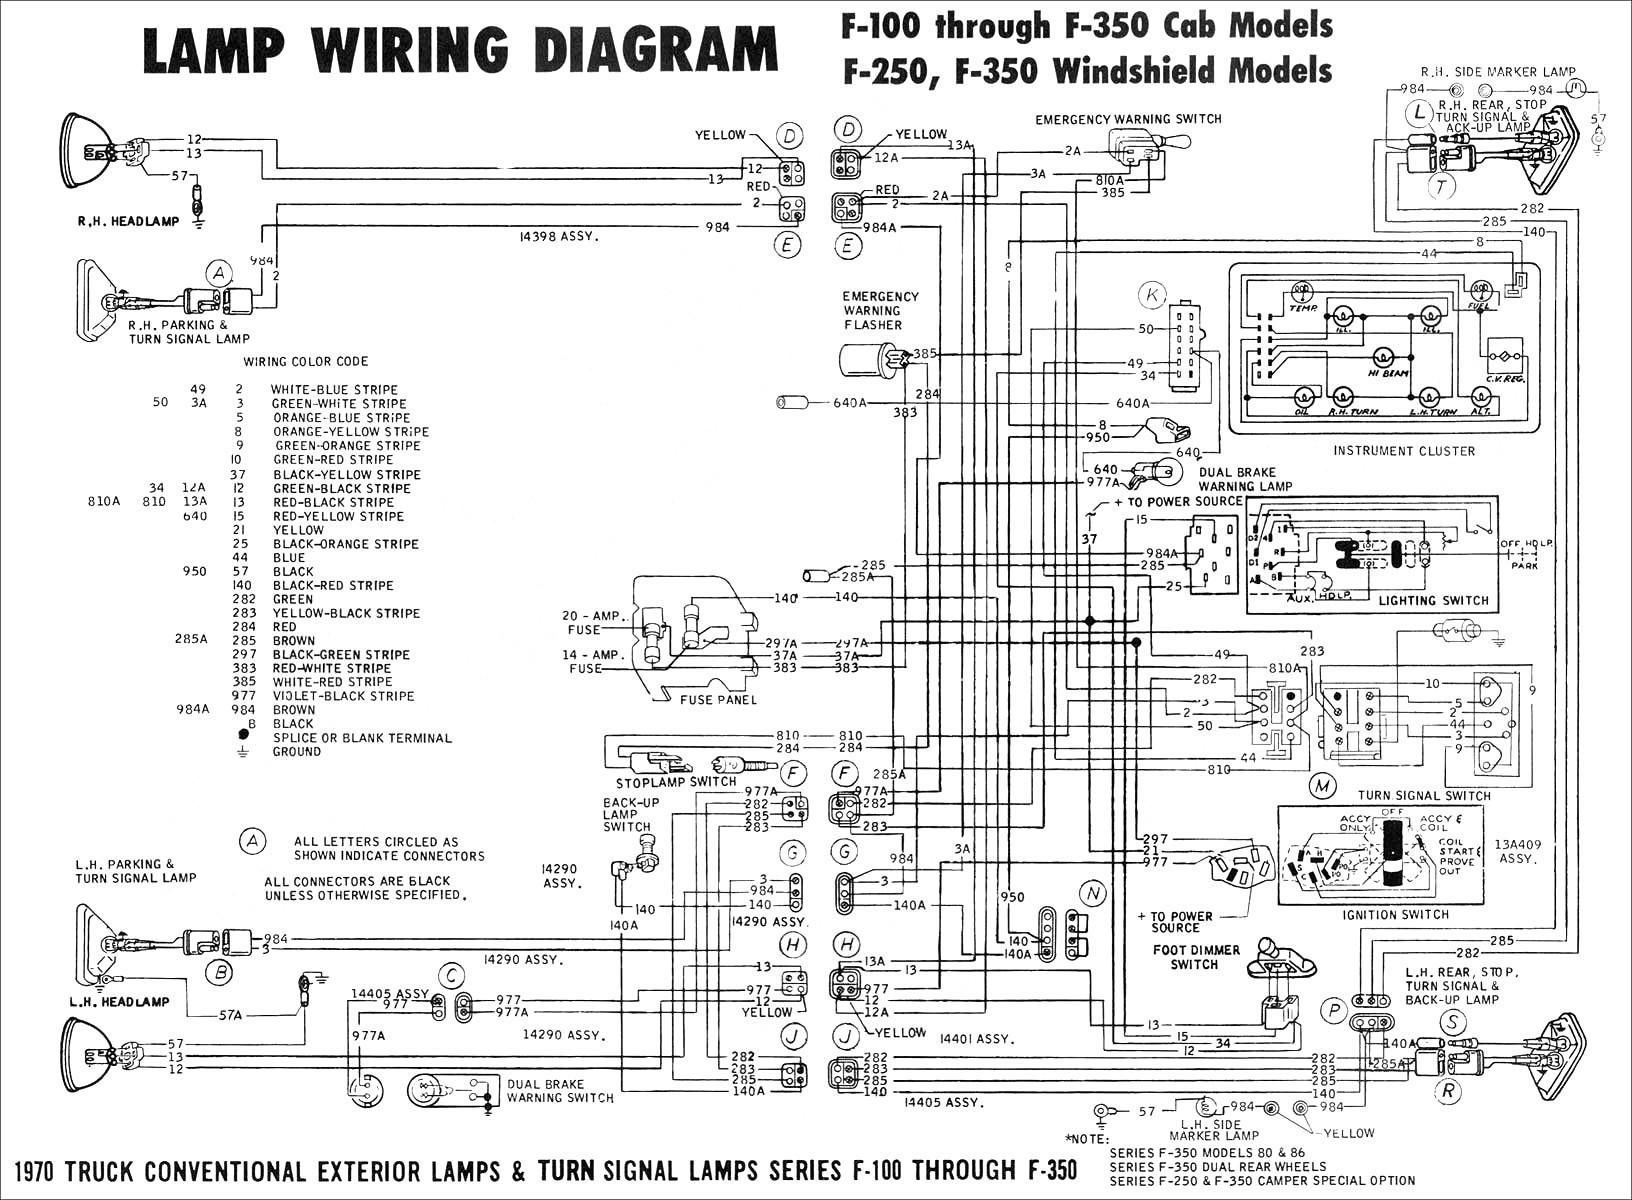 2009 Toyota Tacoma Trailer Wiring Diagram